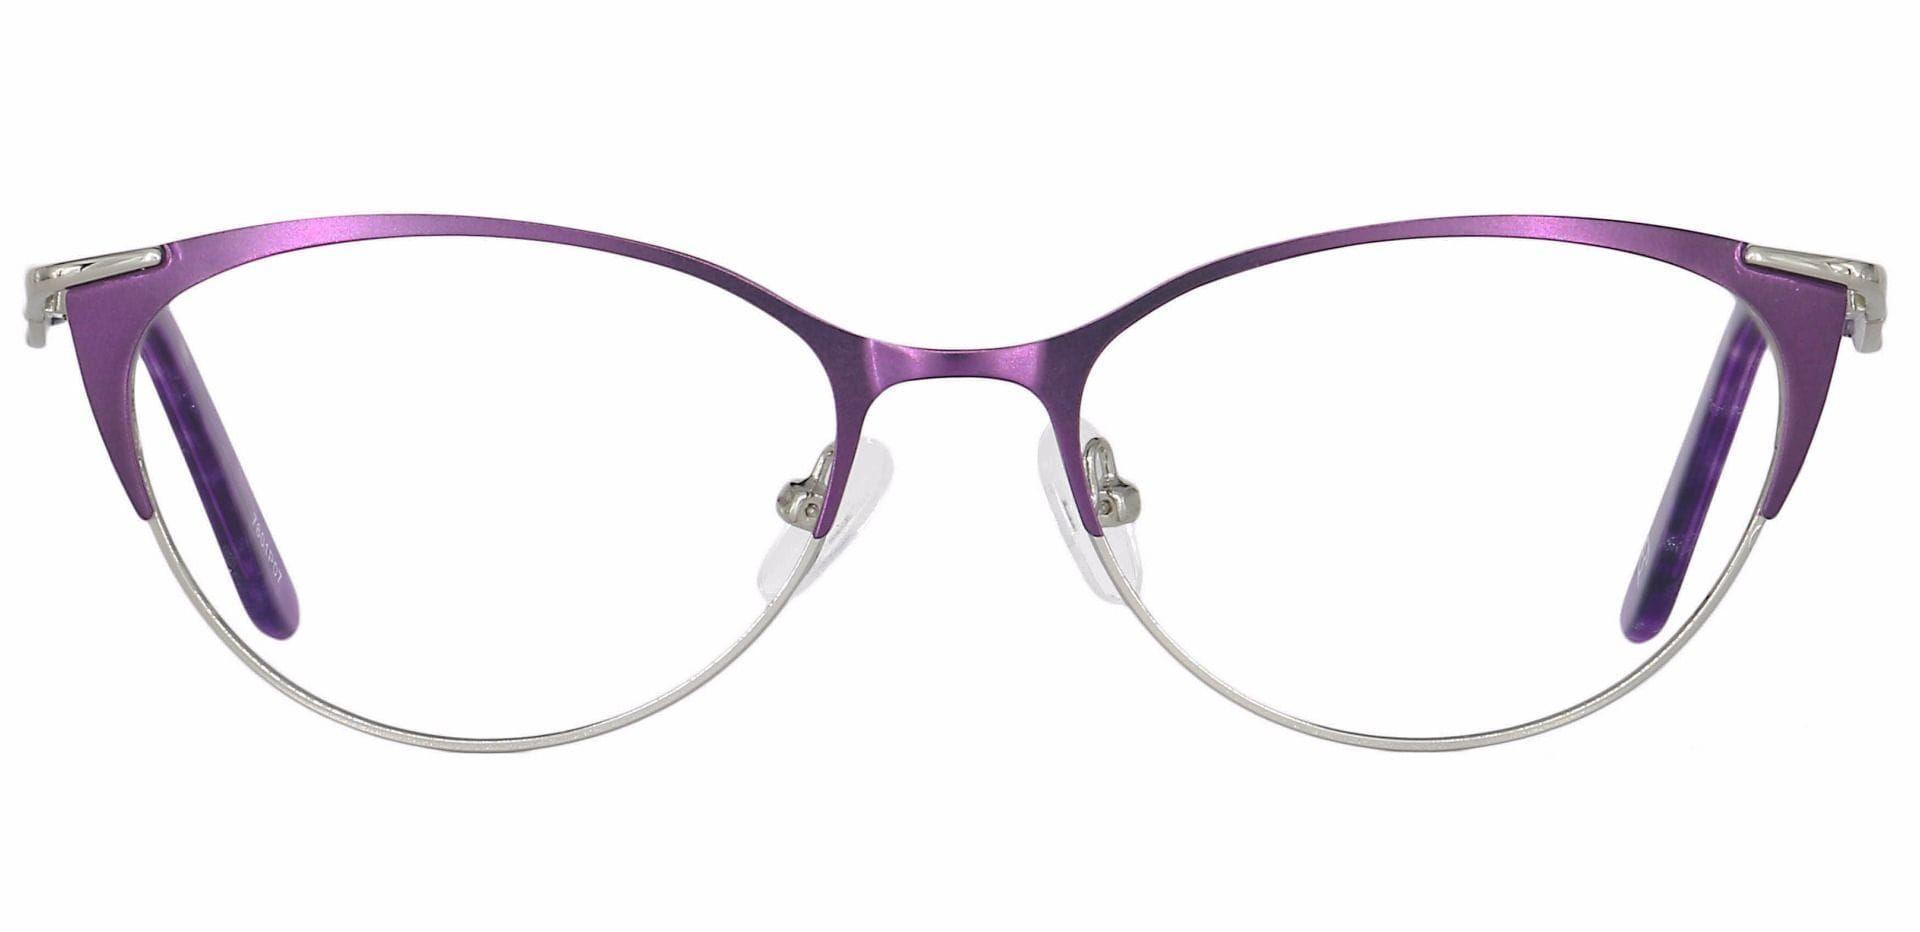 Dee Cat-Eye Lined Bifocal Glasses - Purple